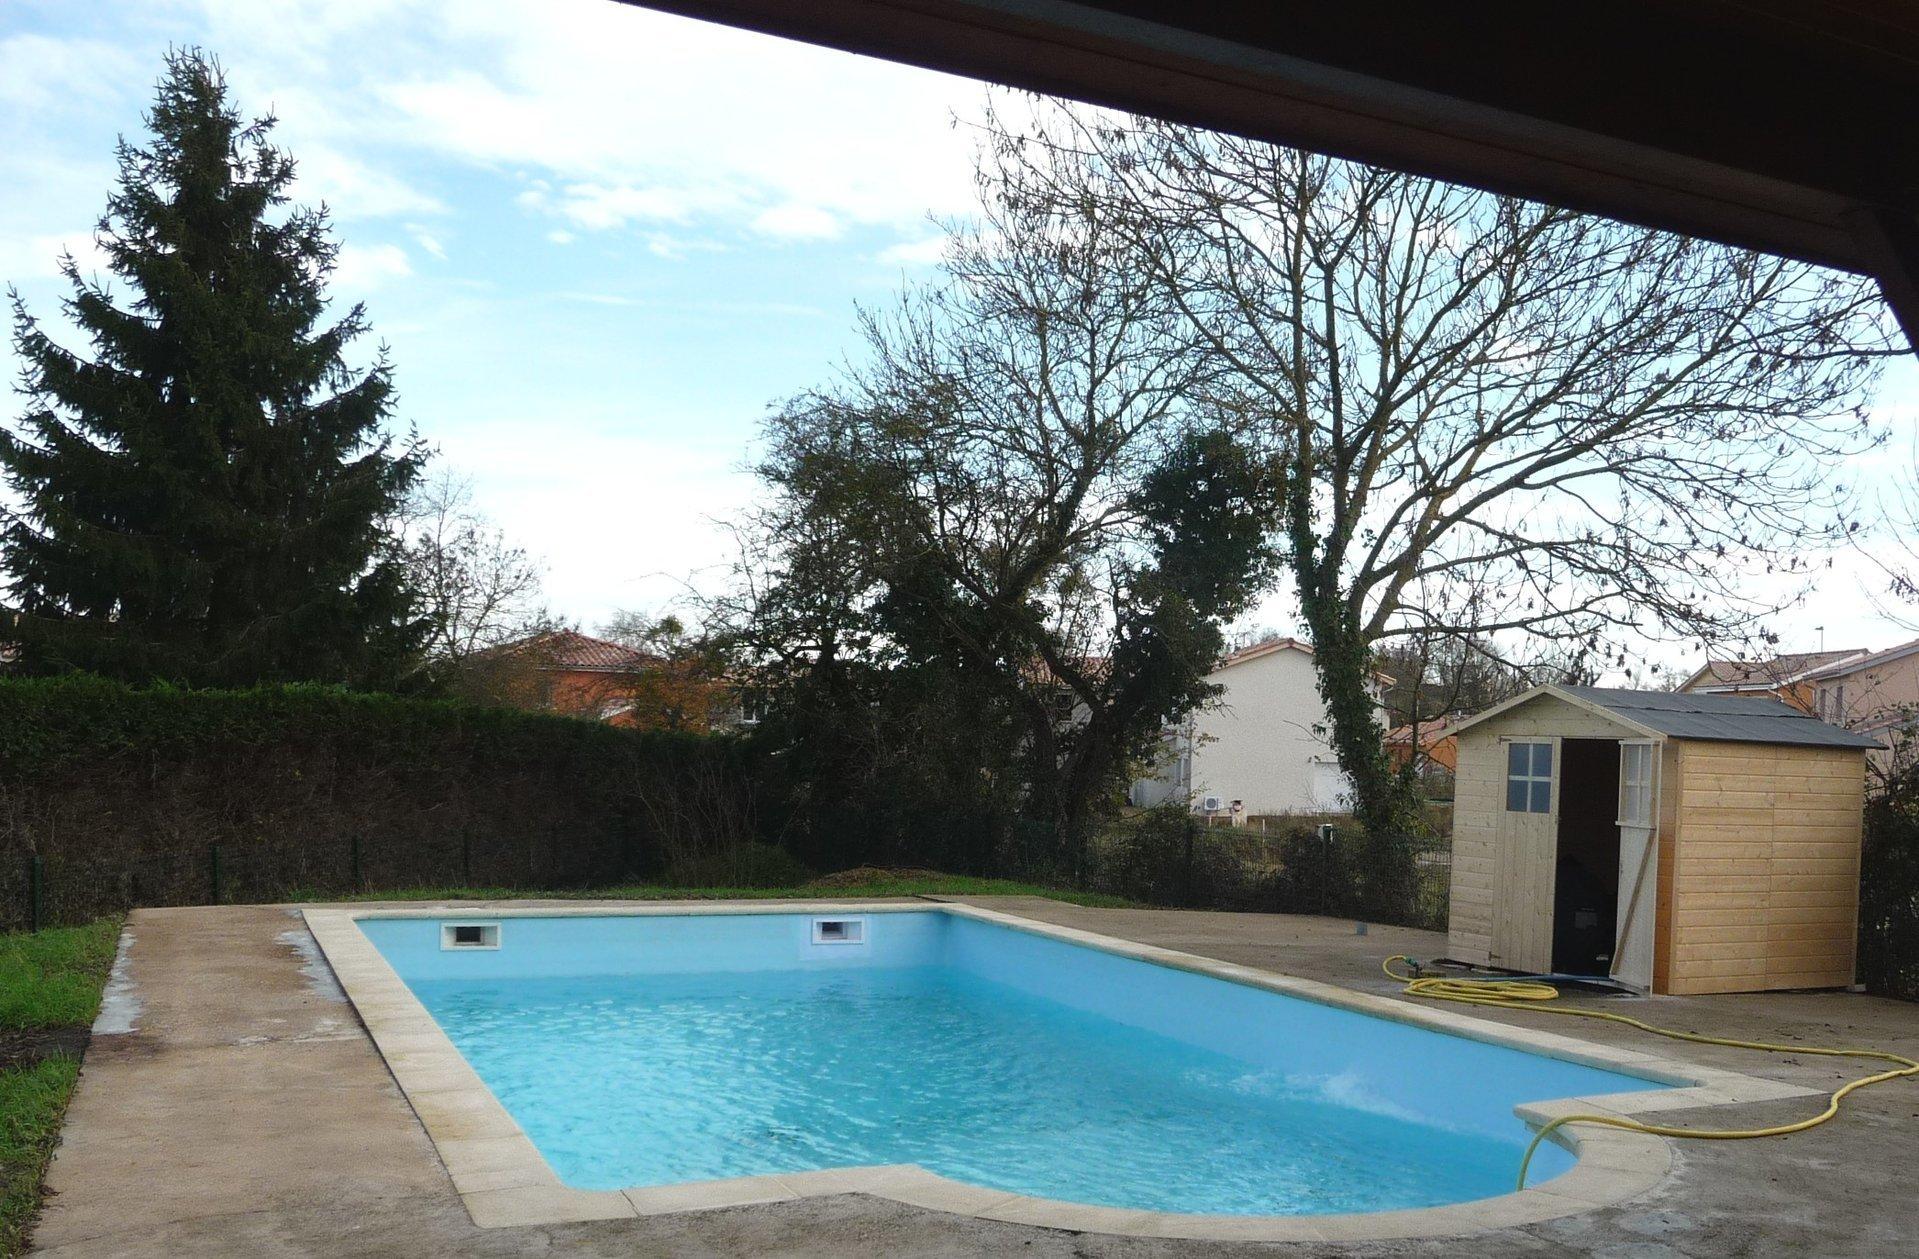 Vente Villa - Villefranche-sur-Saône